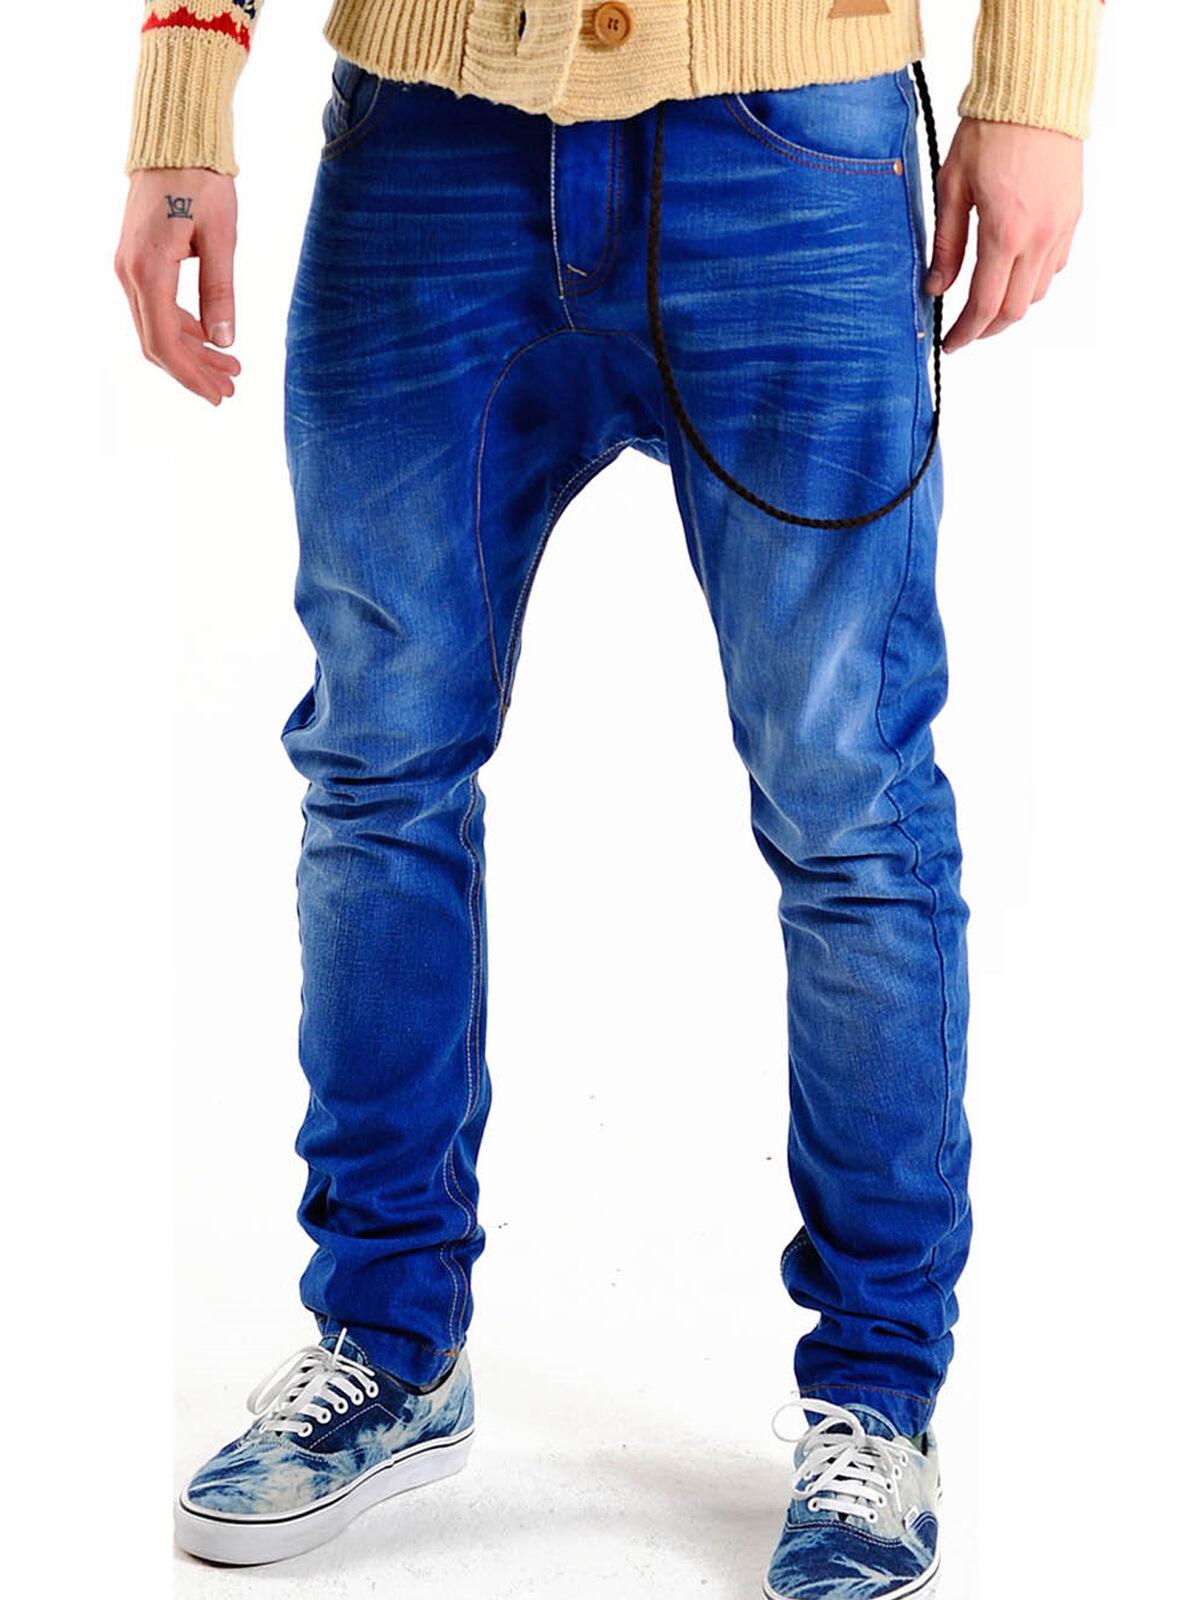 VSCT señores Jeans-pantalones Spencer lowcrojoch rythm Man v-5641135 azul   venta de ofertas